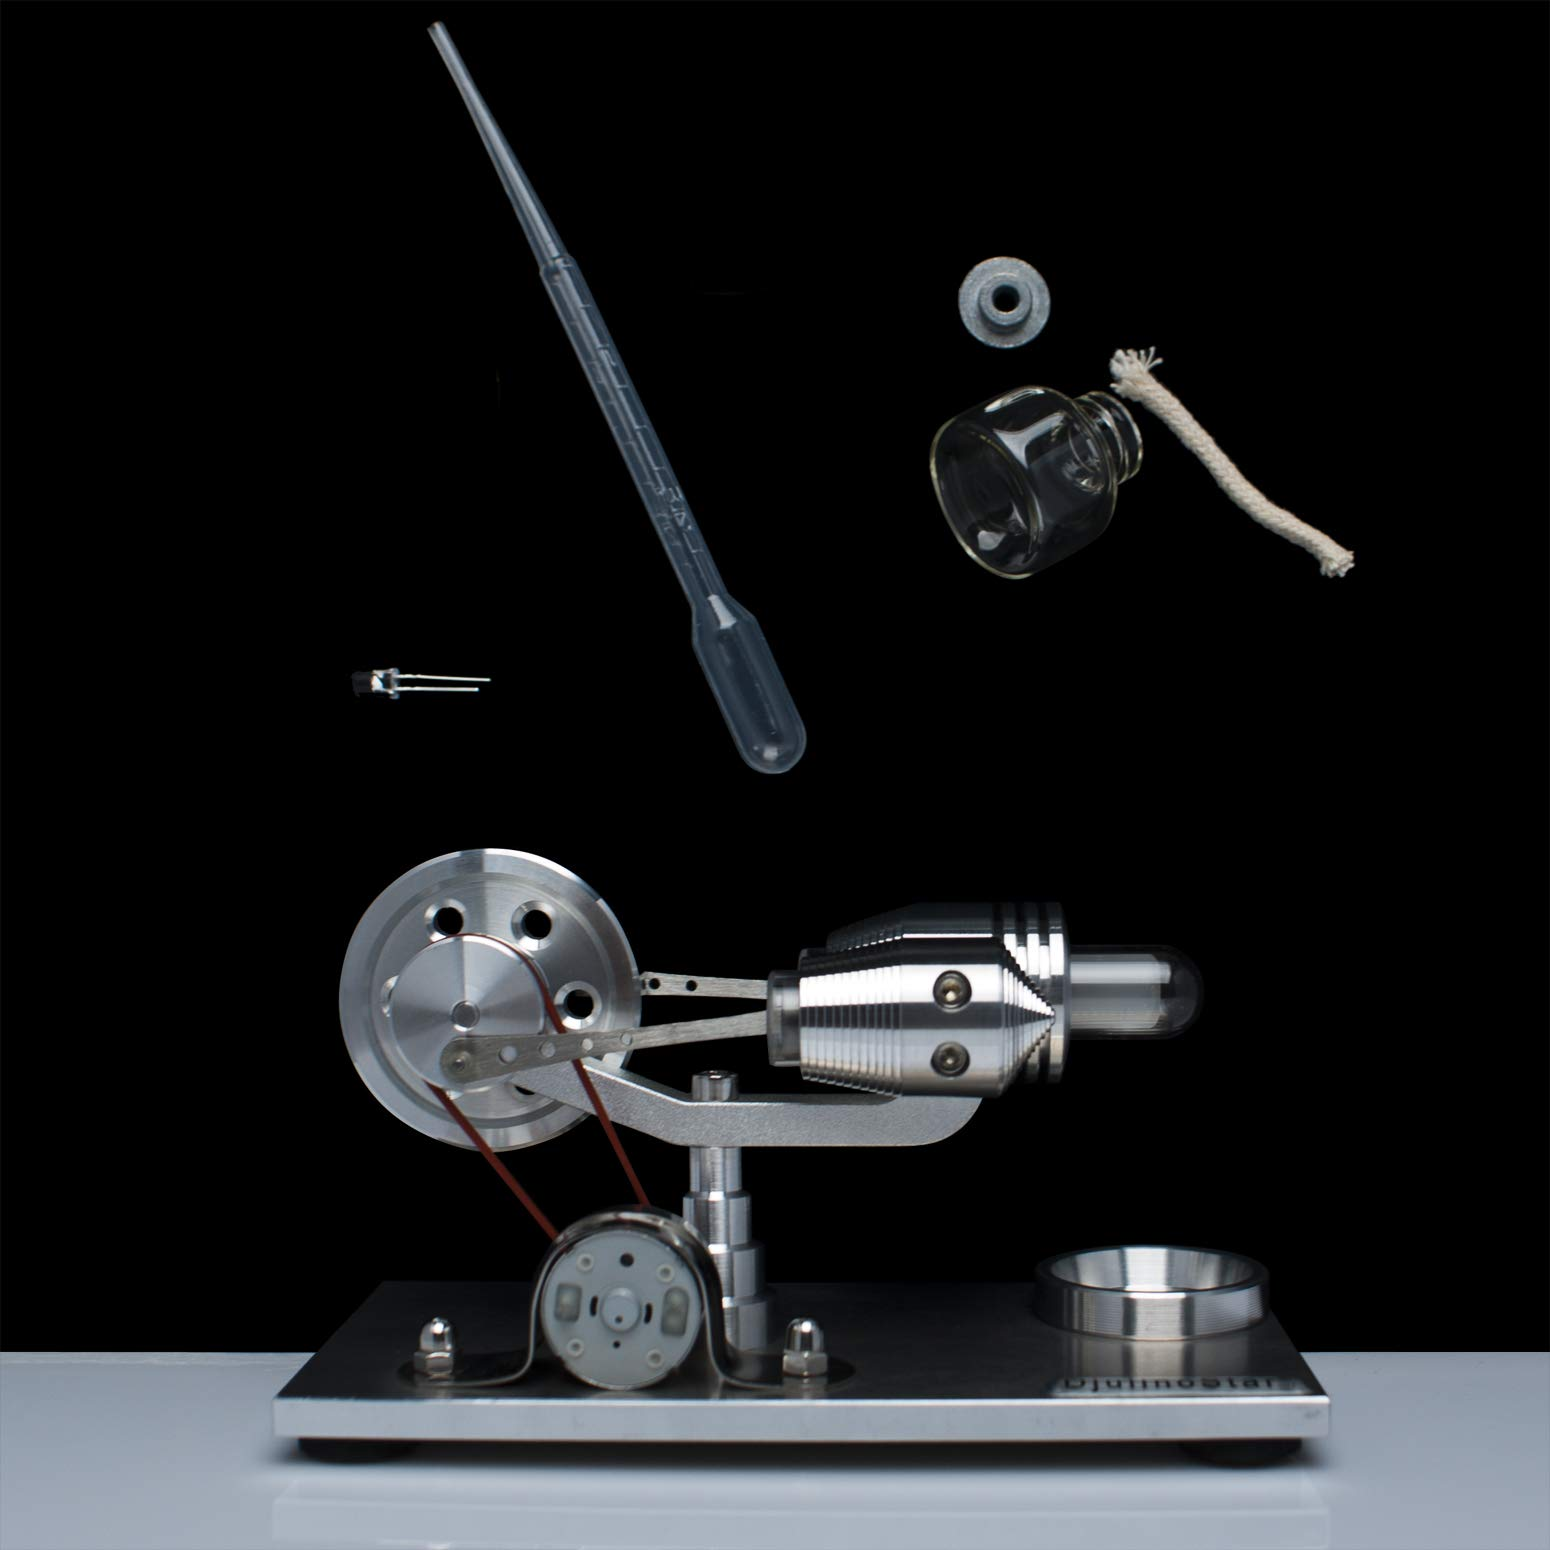 DjuiinoStar Hot Air Stirling Engine, Solid Metal Construction, Electricity Generator(Assembled), My First Stirling Engine by DjuiinoStar (Image #7)